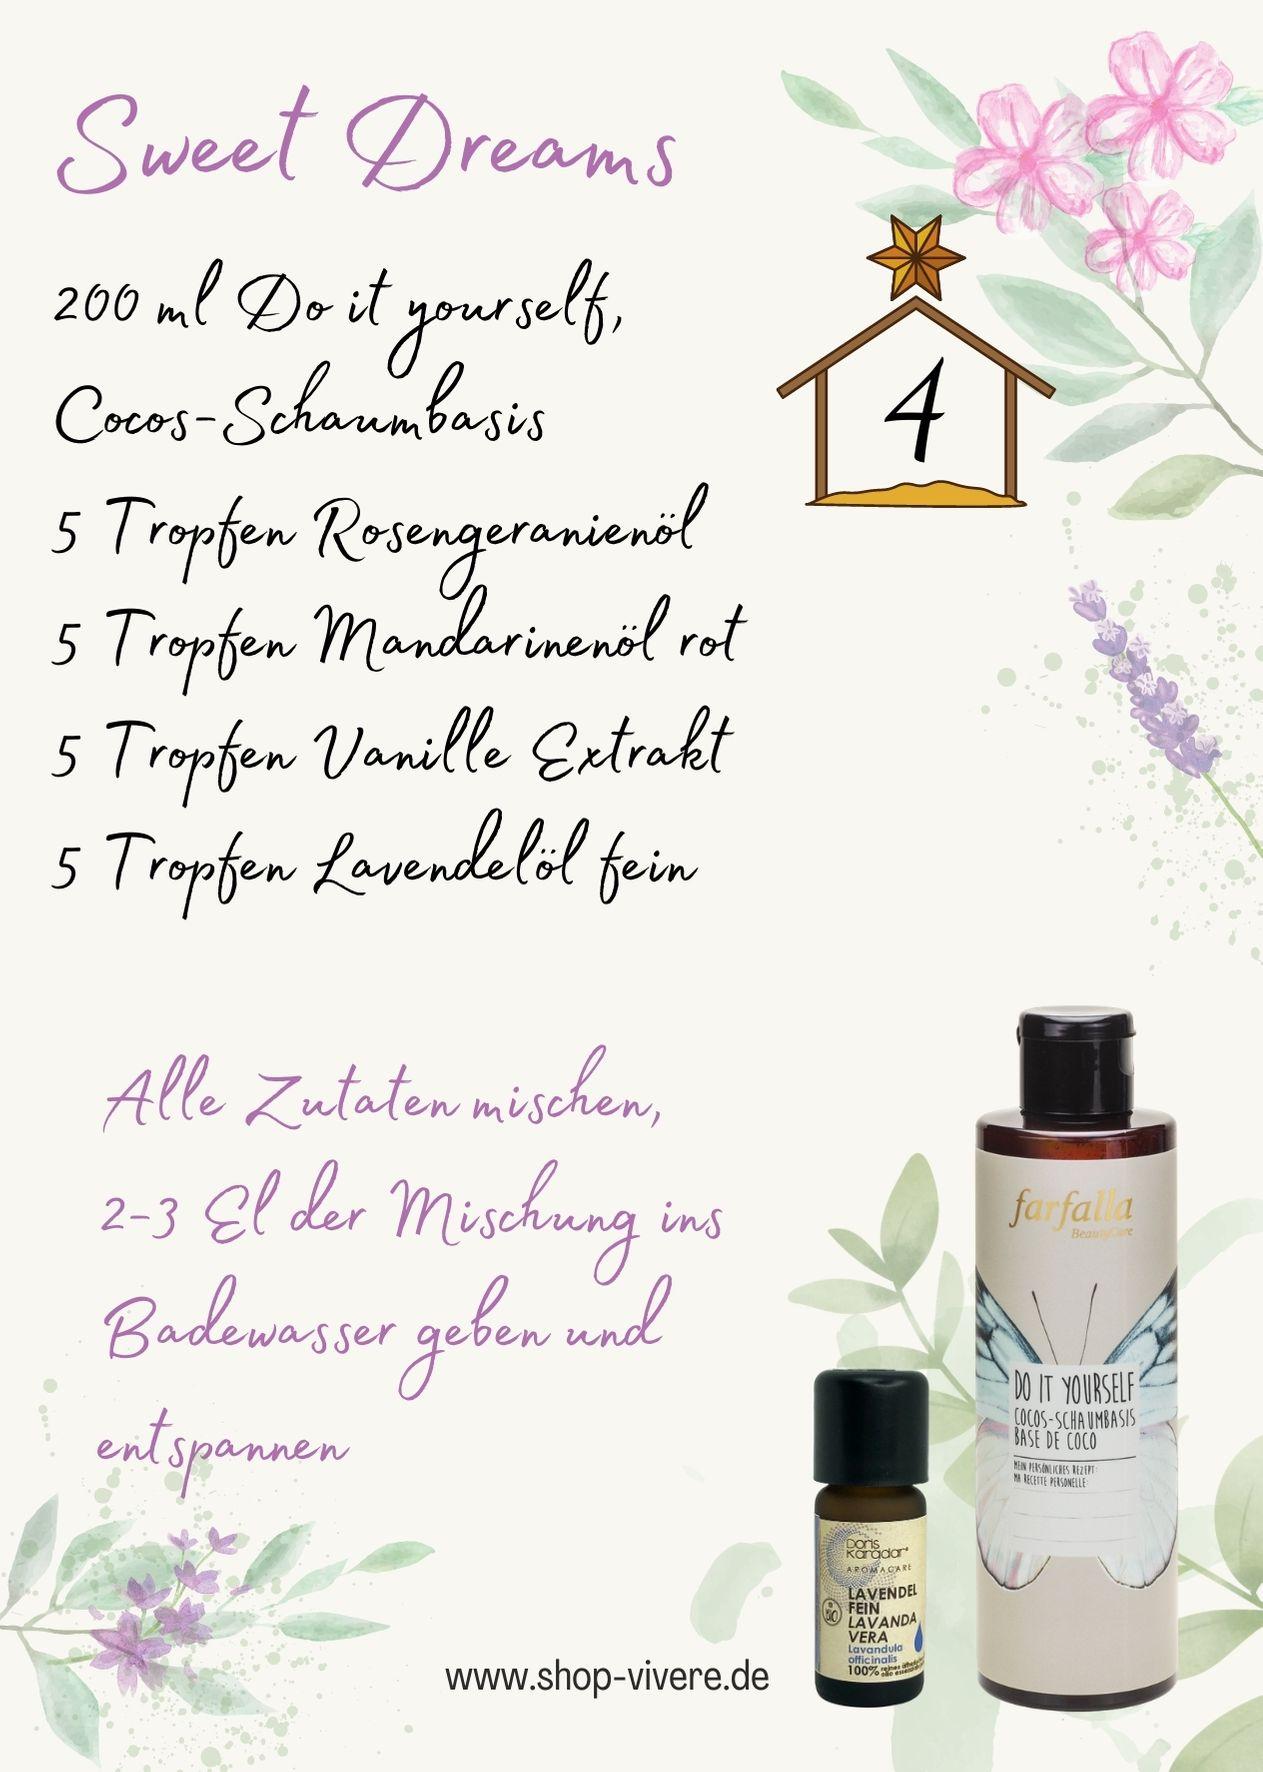 Adventskalender – Aromatherapie 4. Dezember